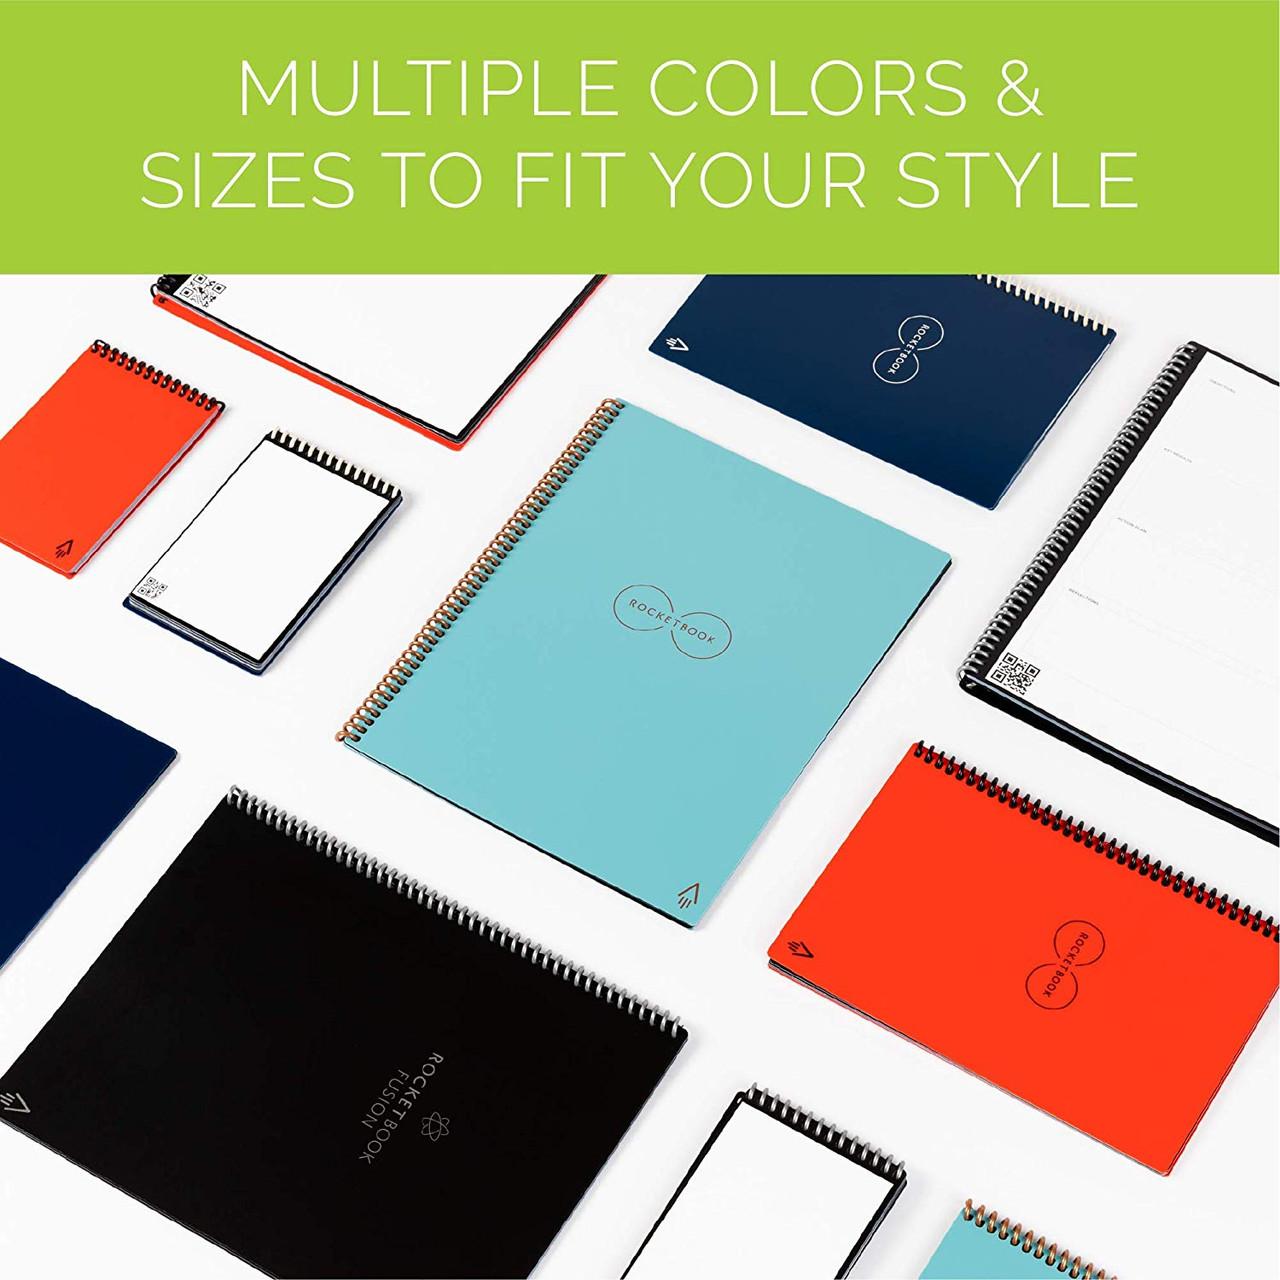 Rocketbook EVR-L-K-CLF Everlast Smart Reusable Notebook with Pen and Microfiber Cloth, Letter Size, Orange